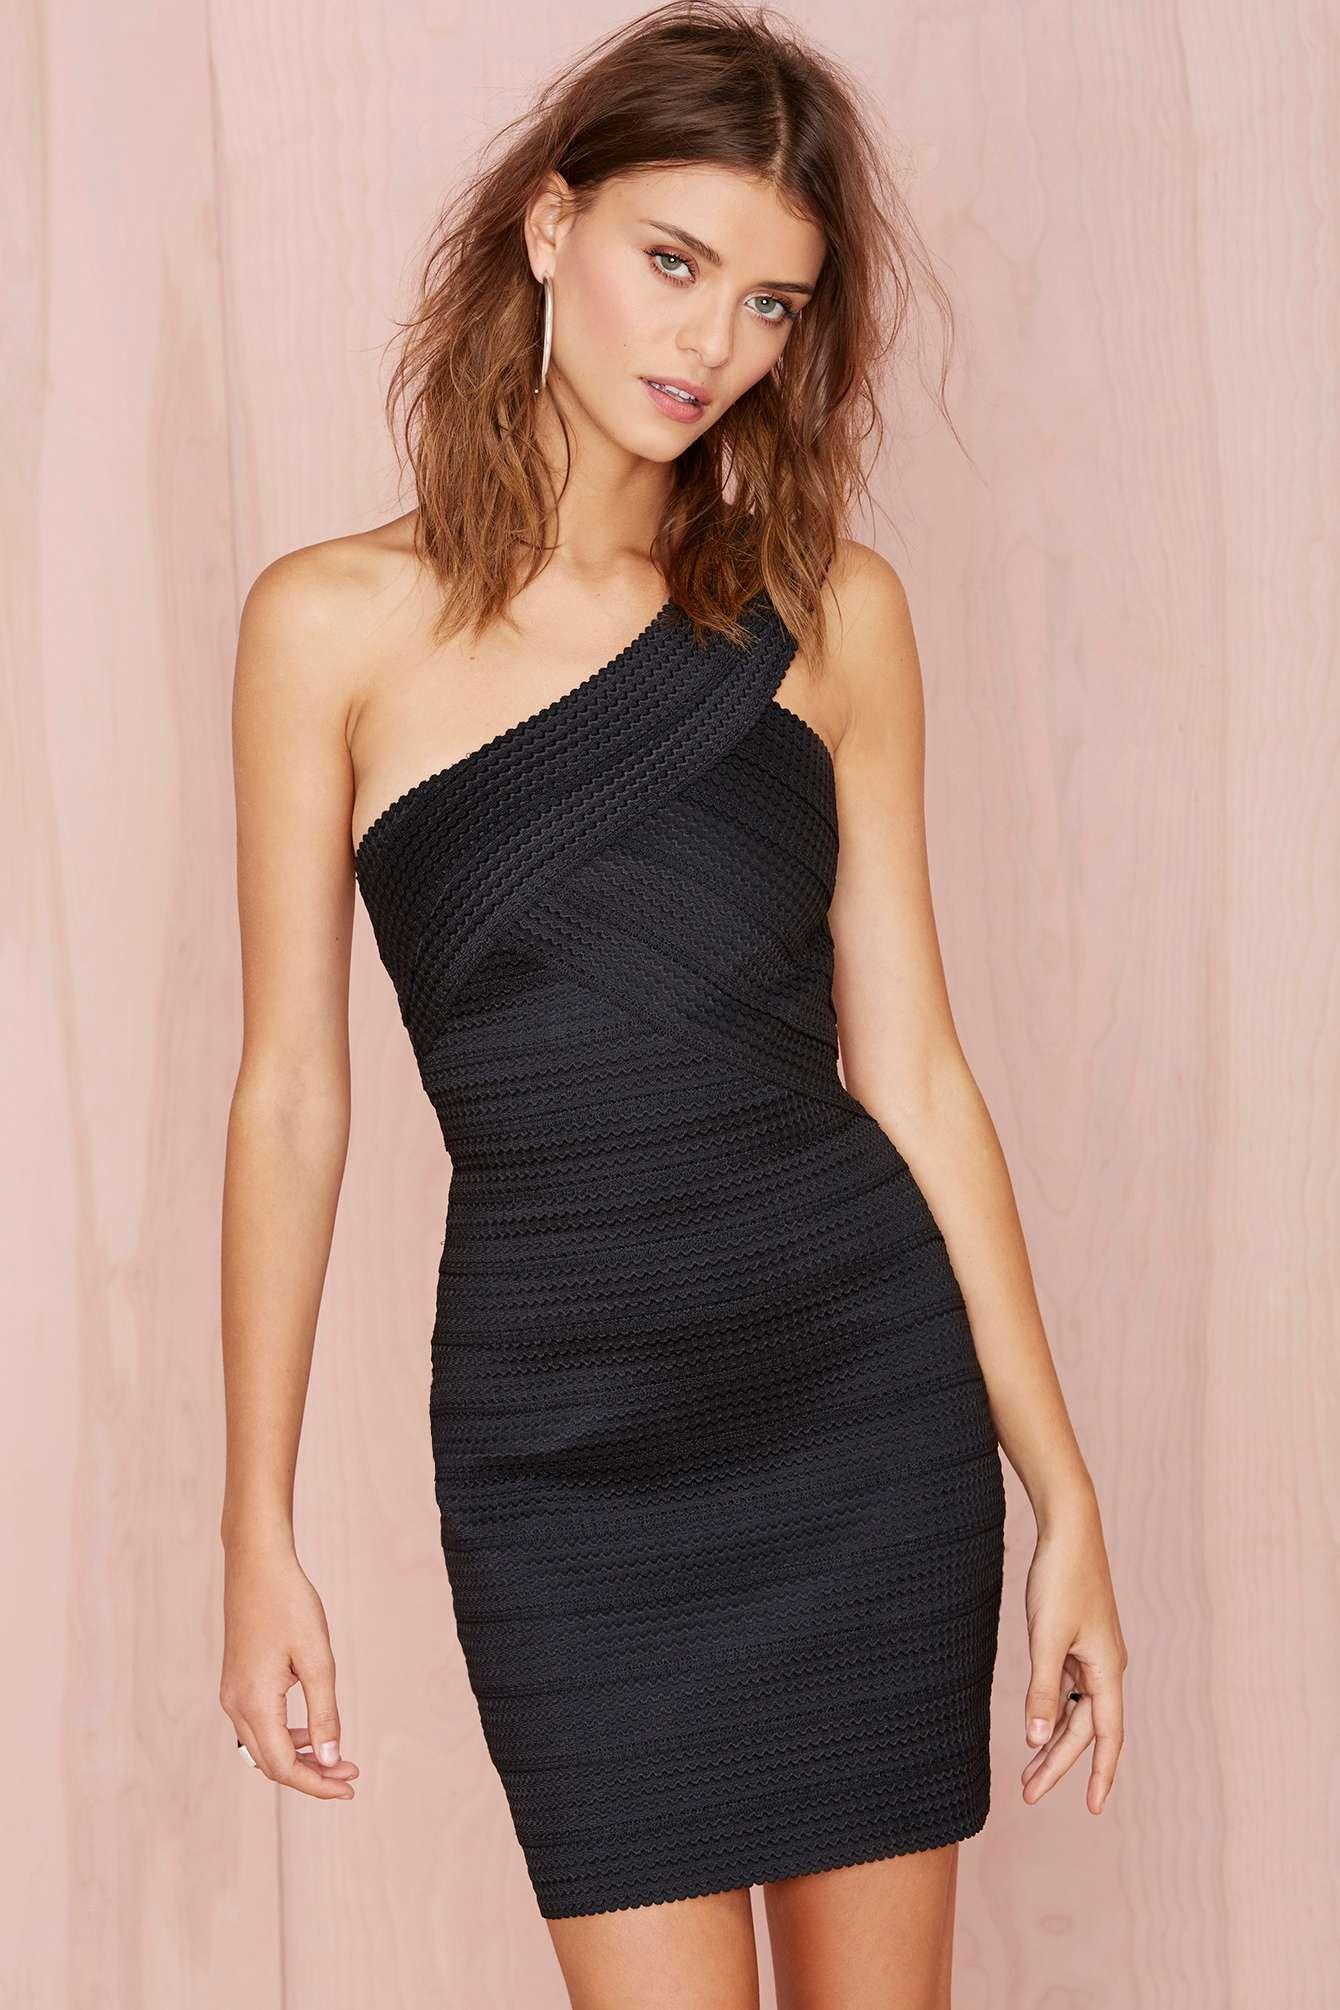 Kiki dress fashion pinterest dresses on sale cyber monday and